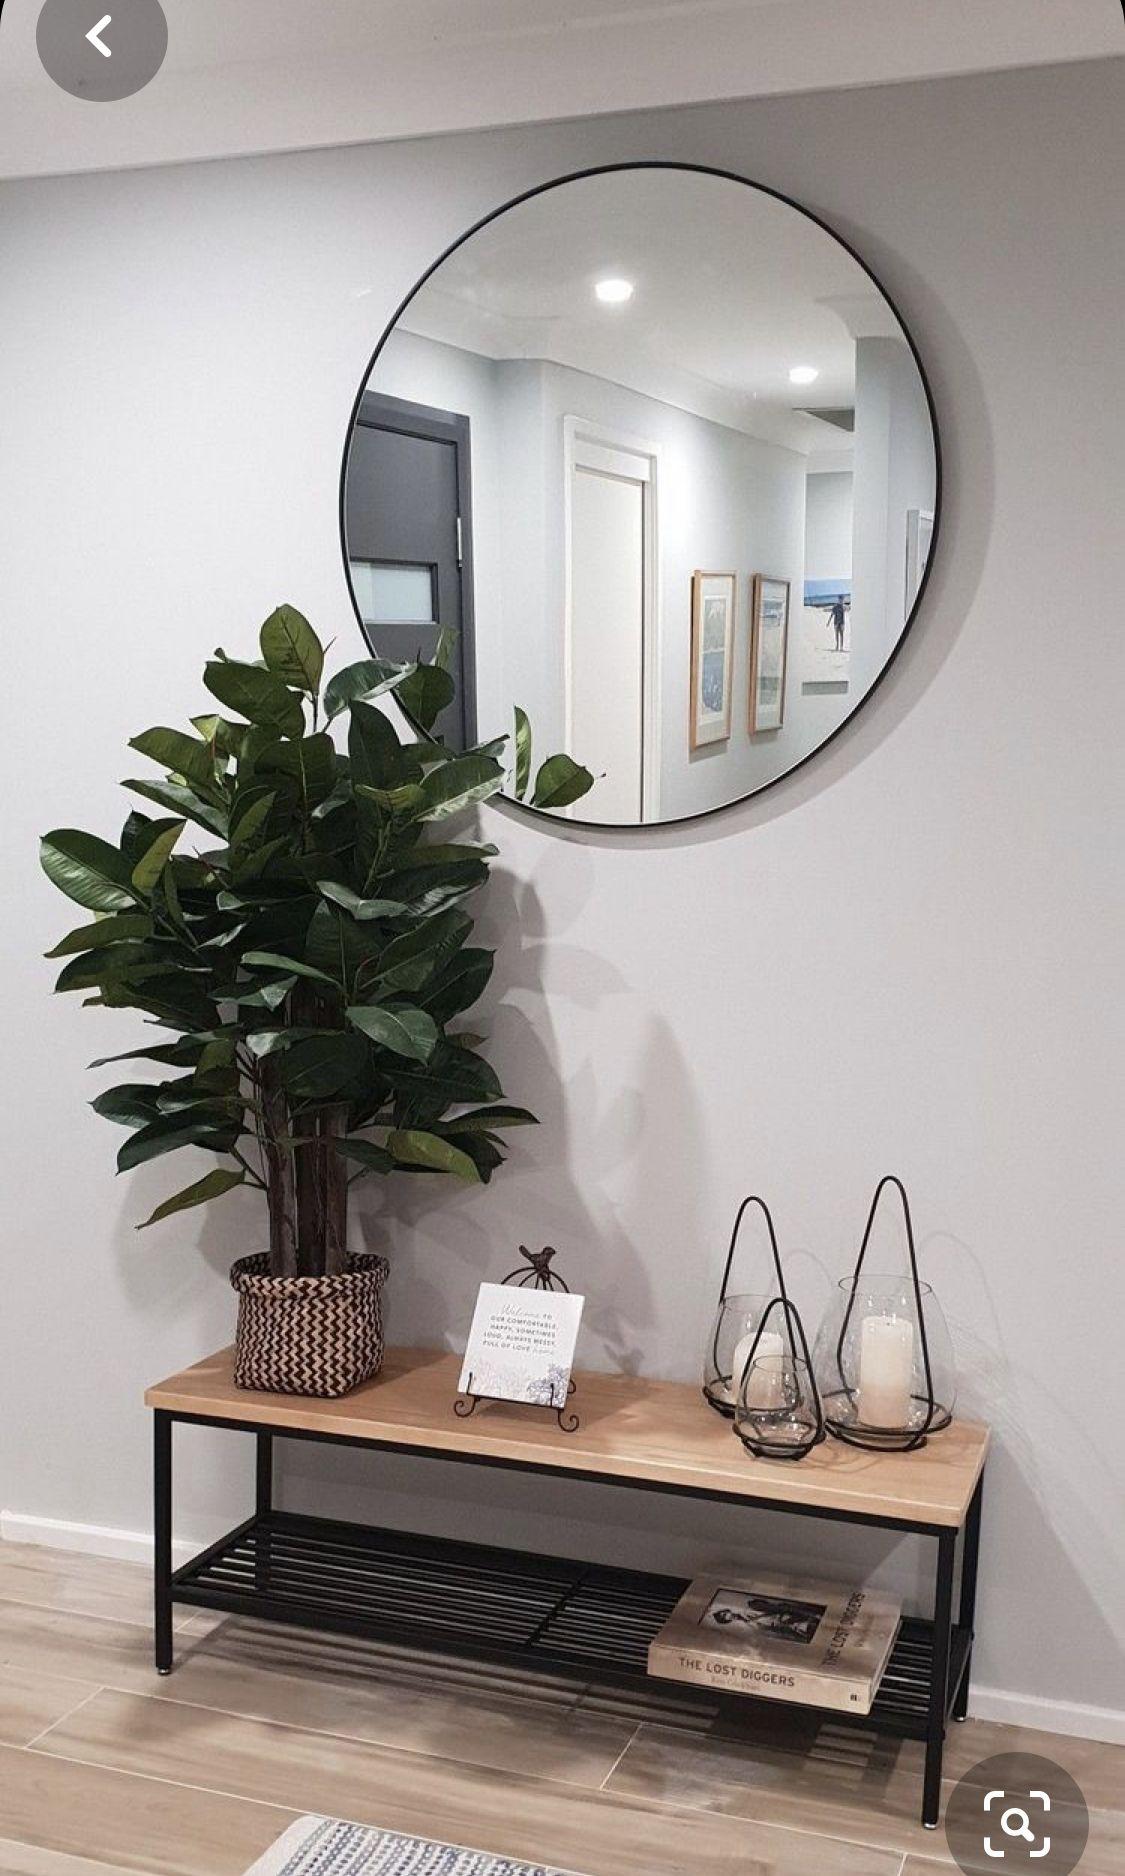 Pin by Suzie Platt on New house ideas in 2020 Home decor